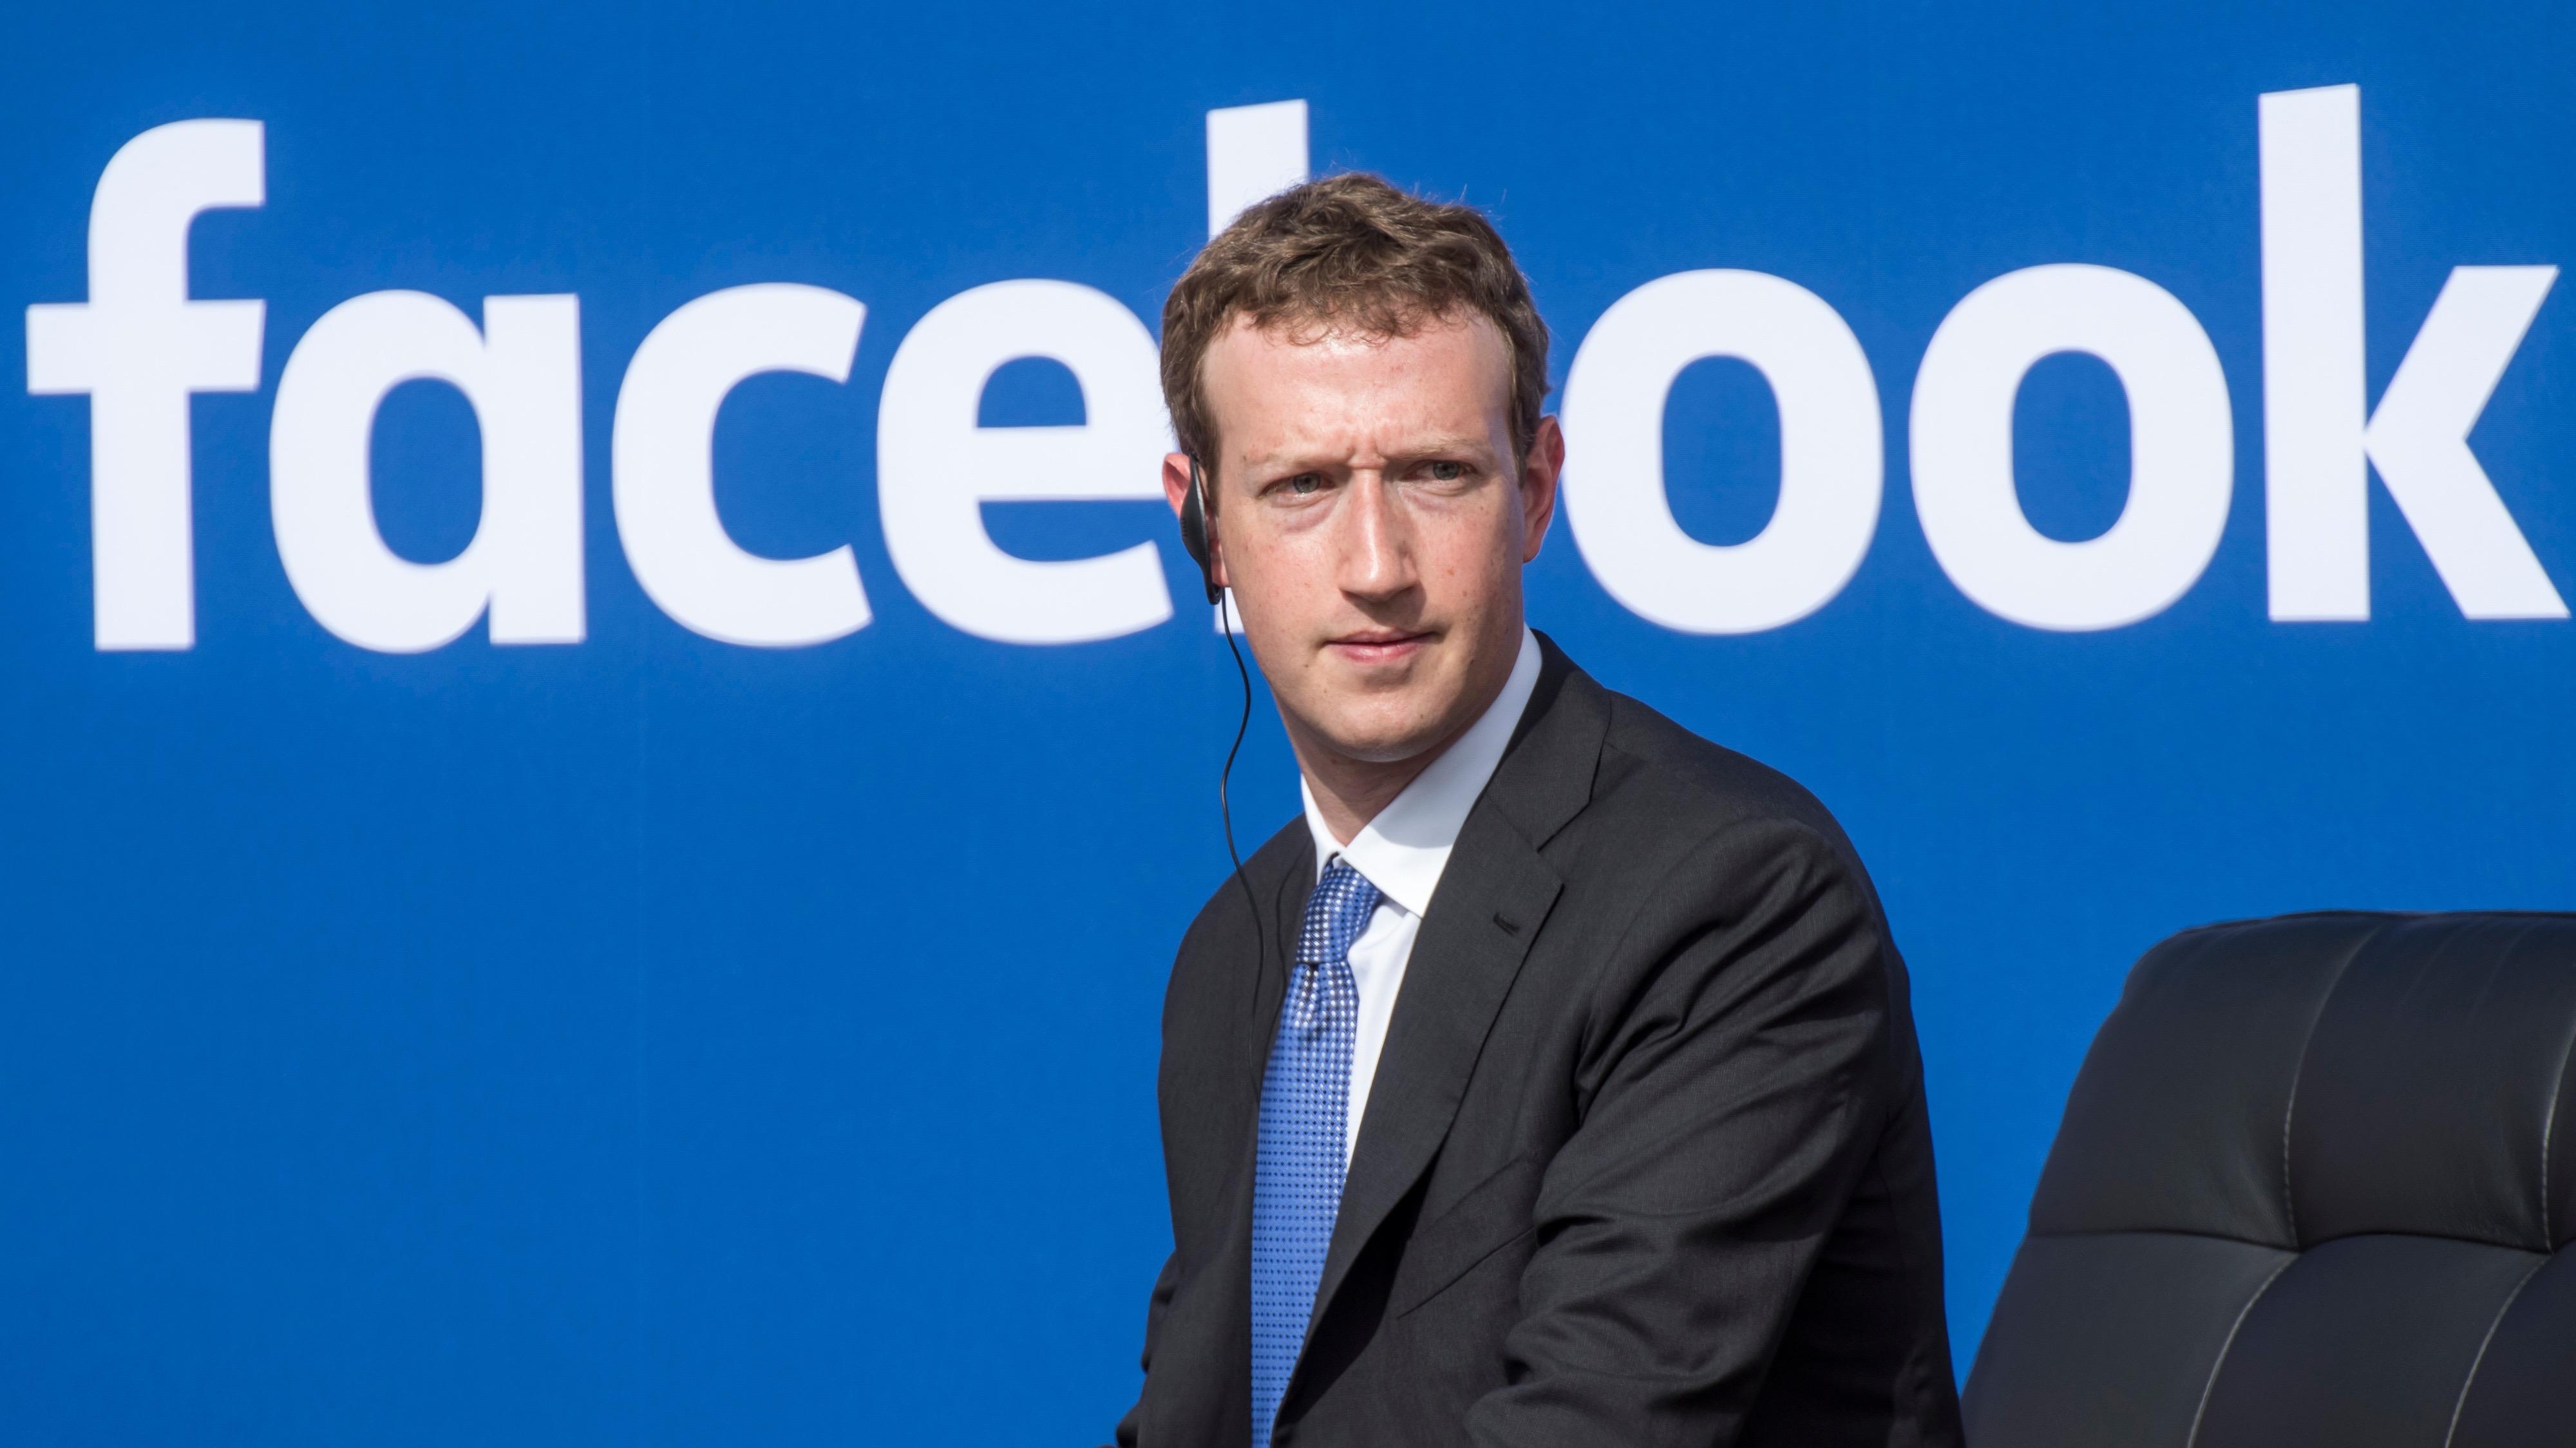 Zuckerberg Talks 'Military Strategy' But Denies He Is Running For President